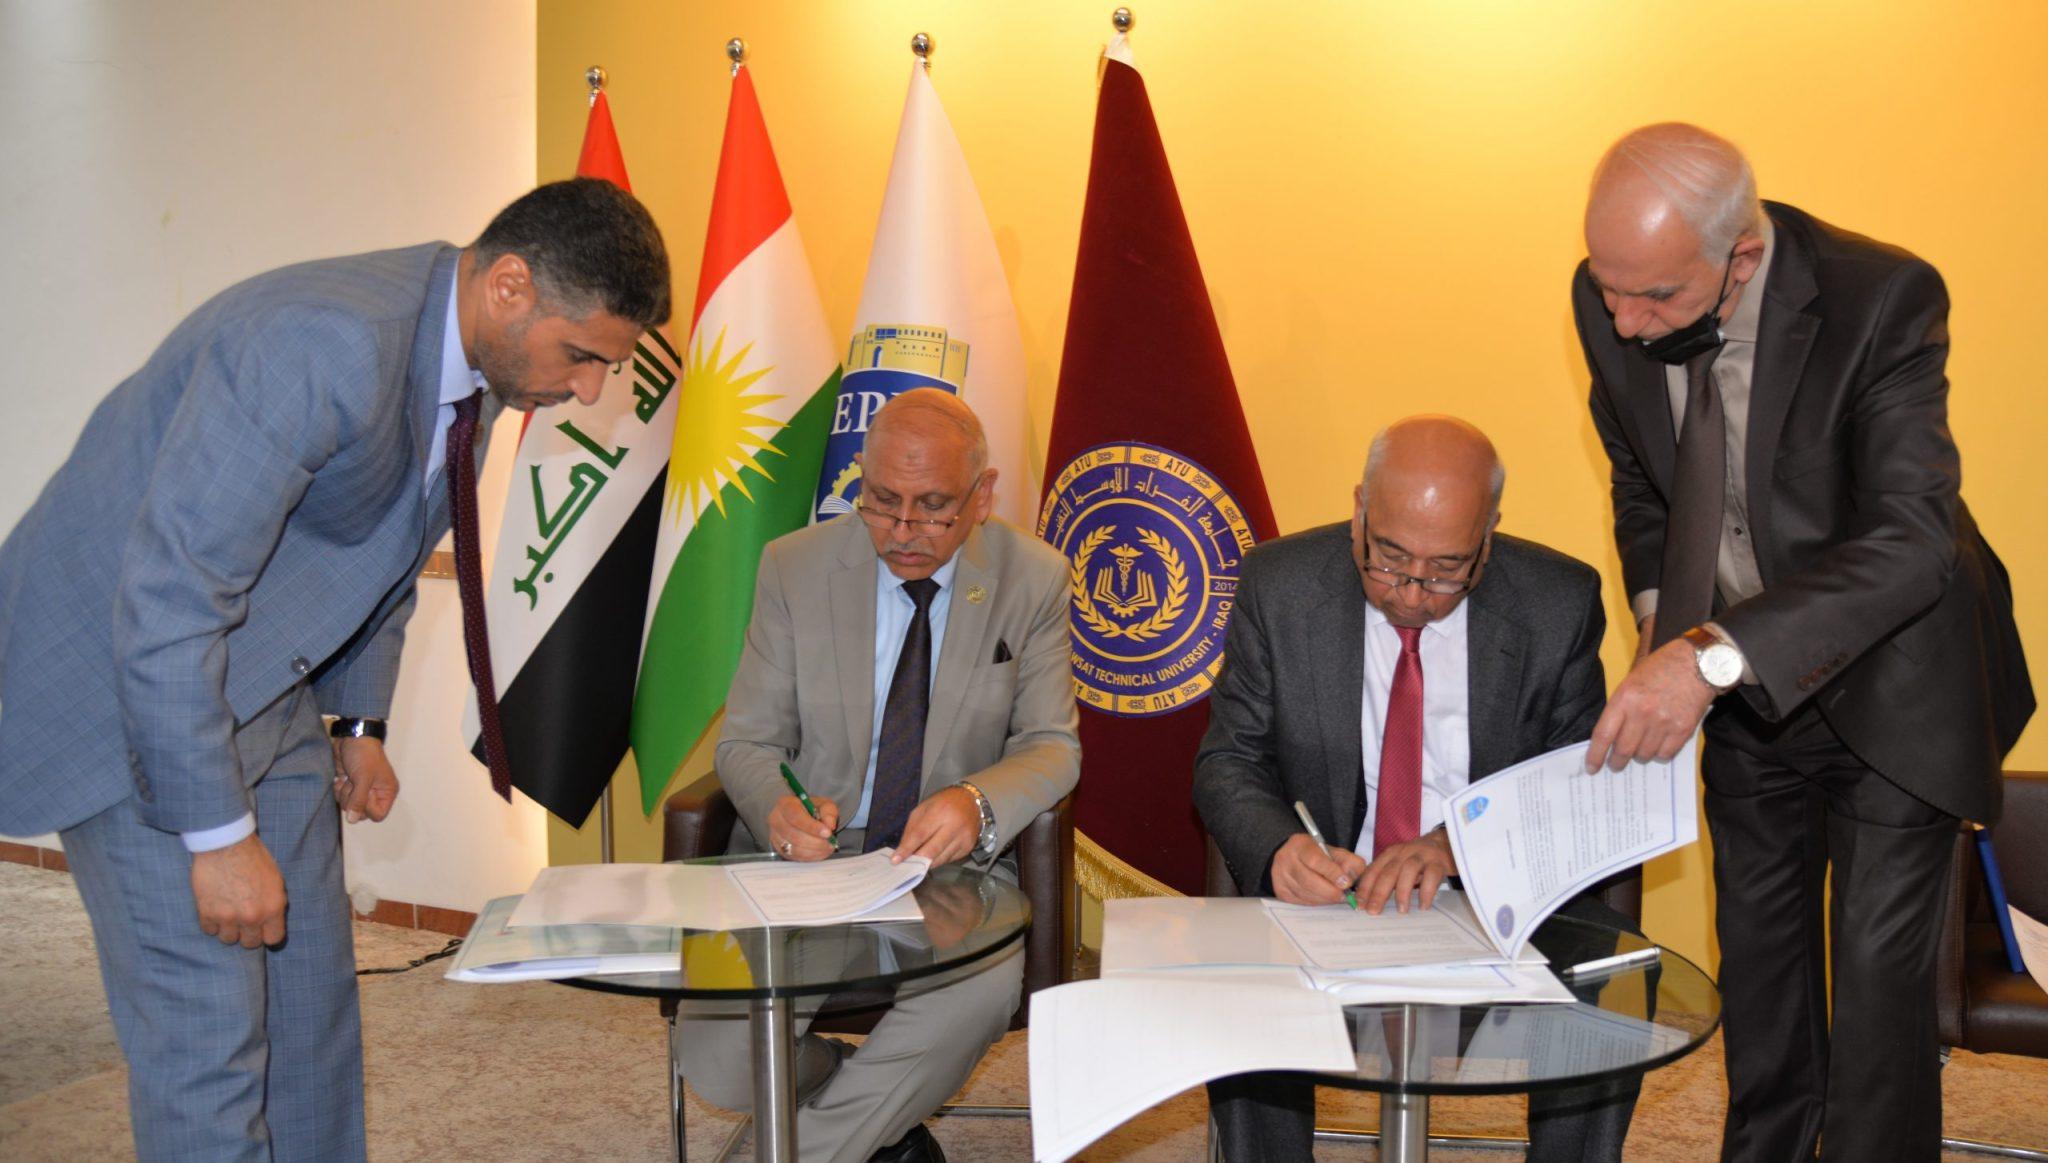 Erbil Polytechnic University and Al-furat- al-awsat Technical University have signed a Memorandum of Understanding